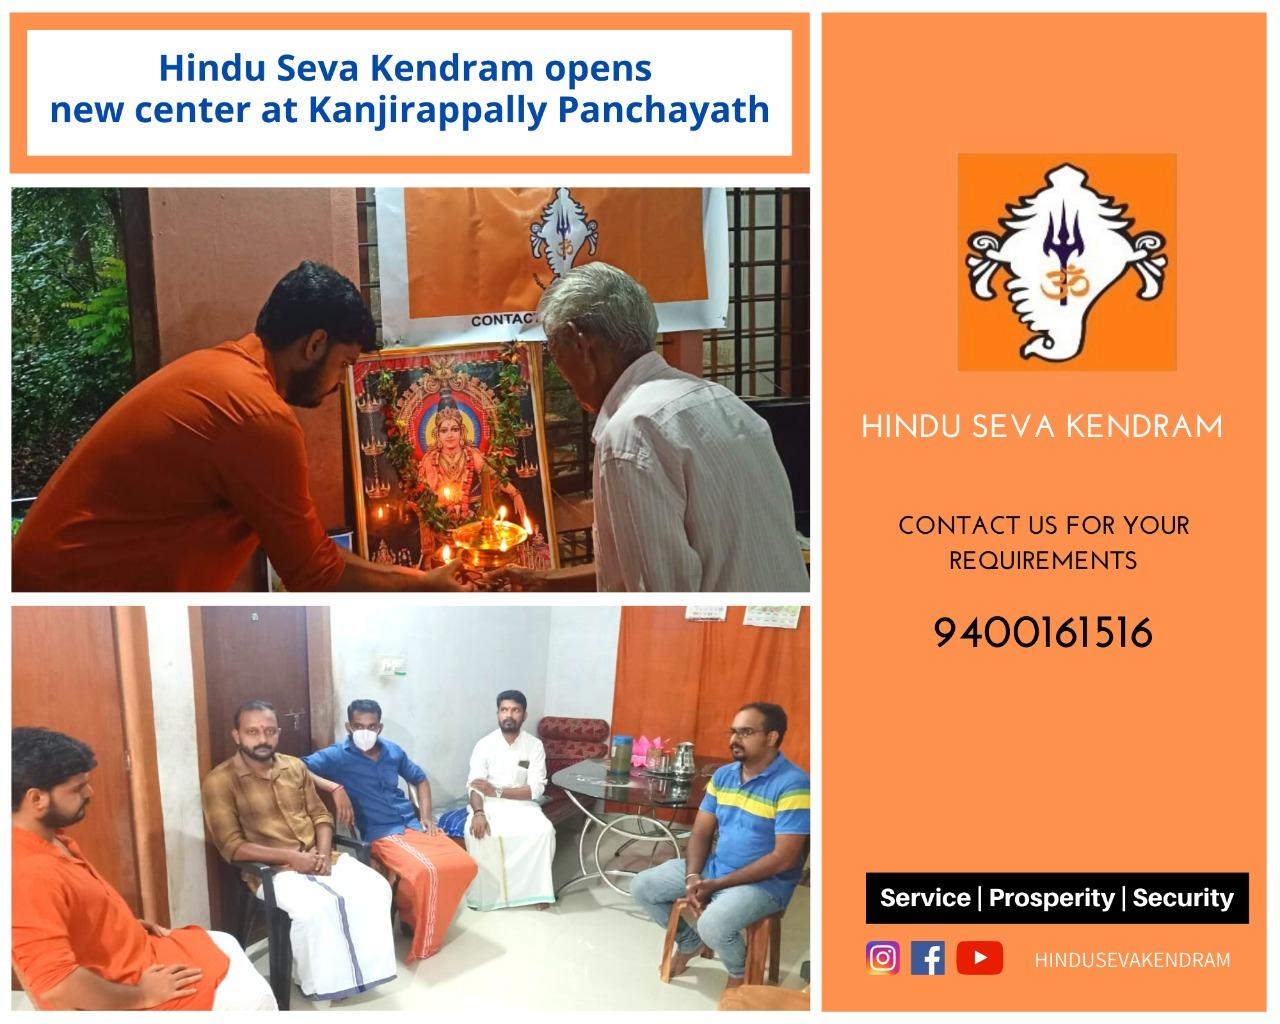 Hindu Seva Kendram opens new center at Kanjirappally Panchayath